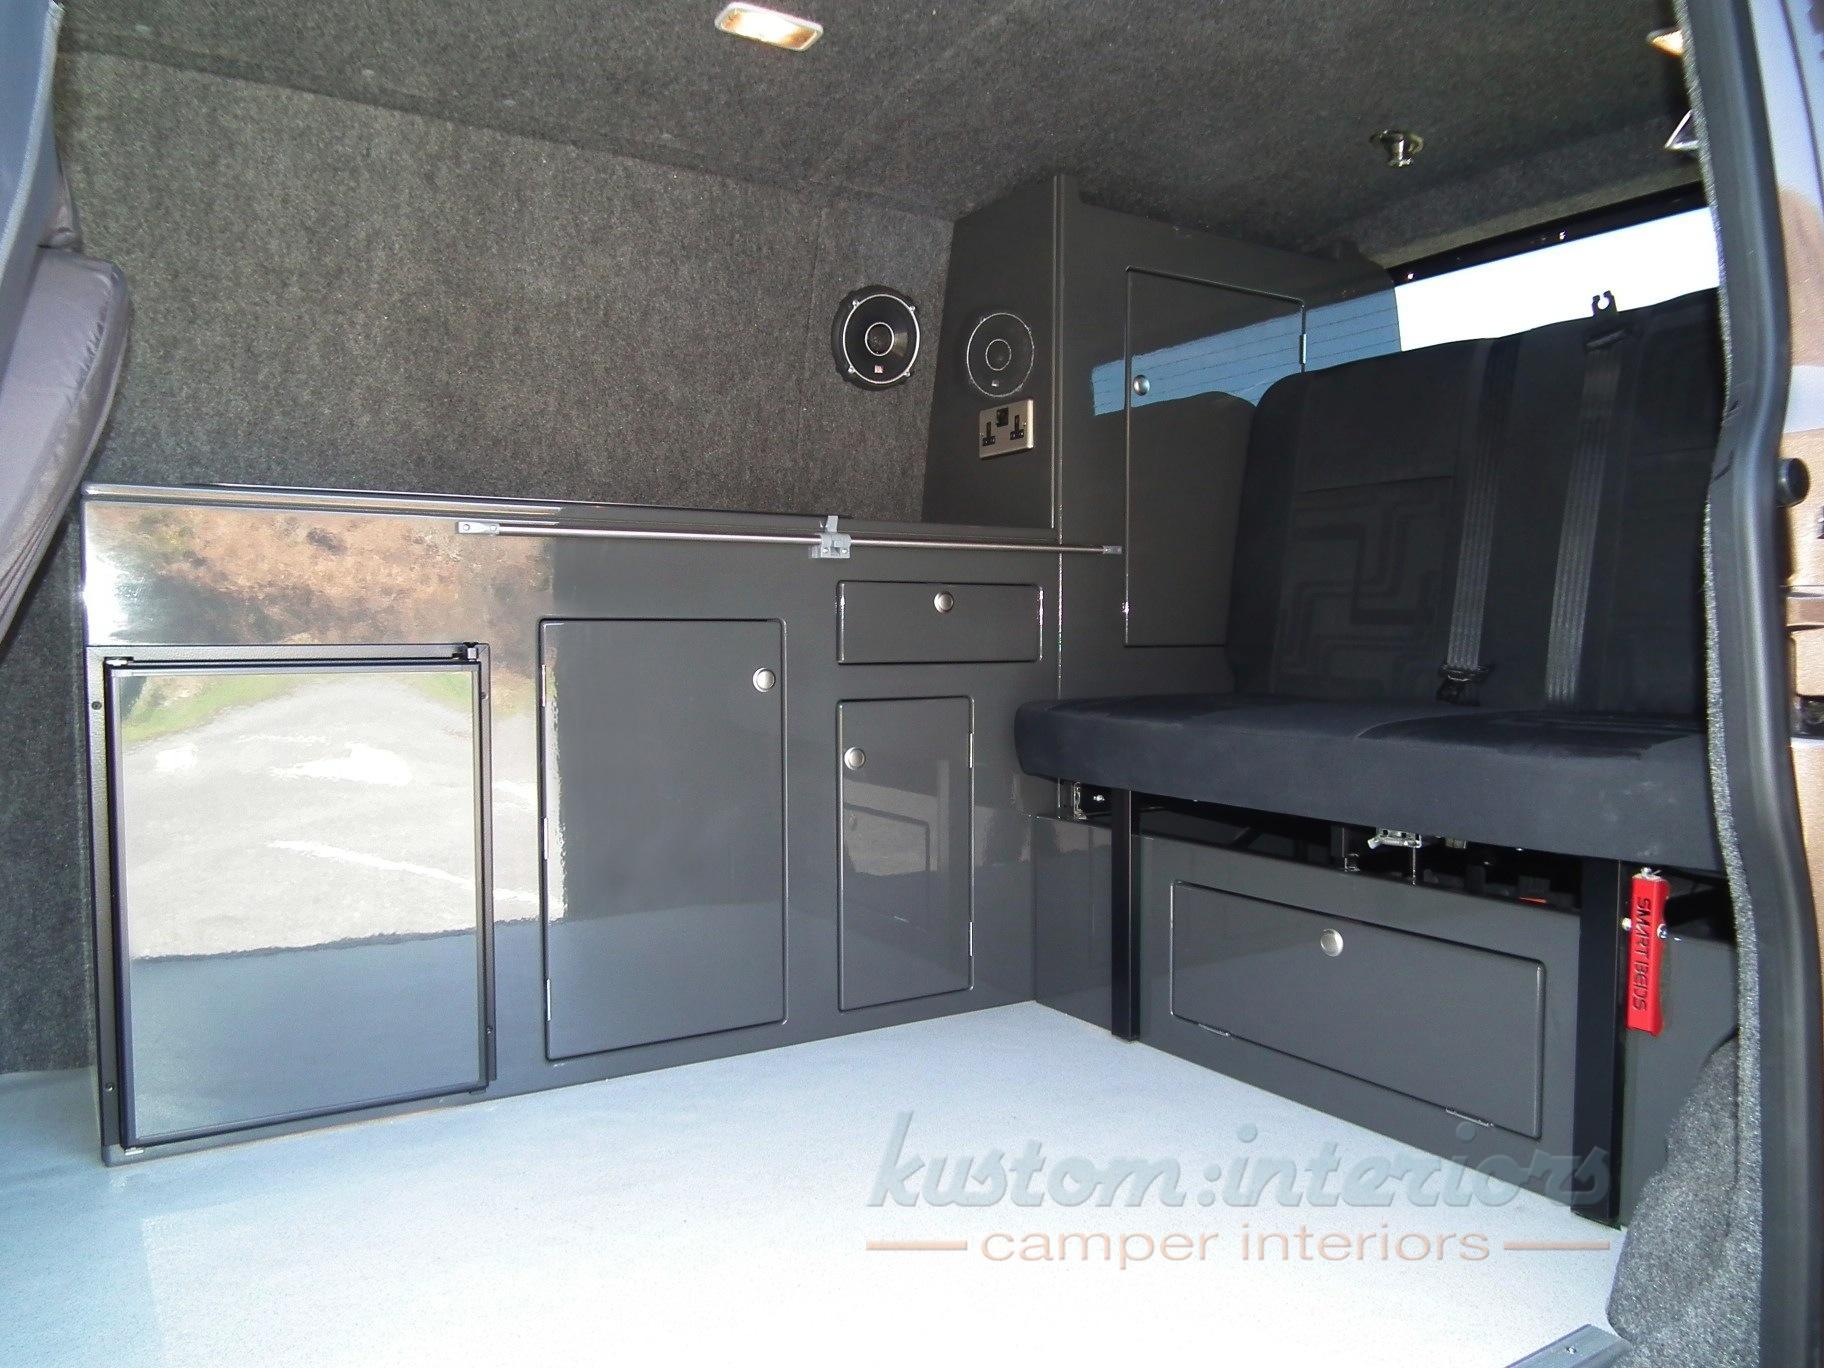 Transporter Interiors Vw Camper Interiors Camper